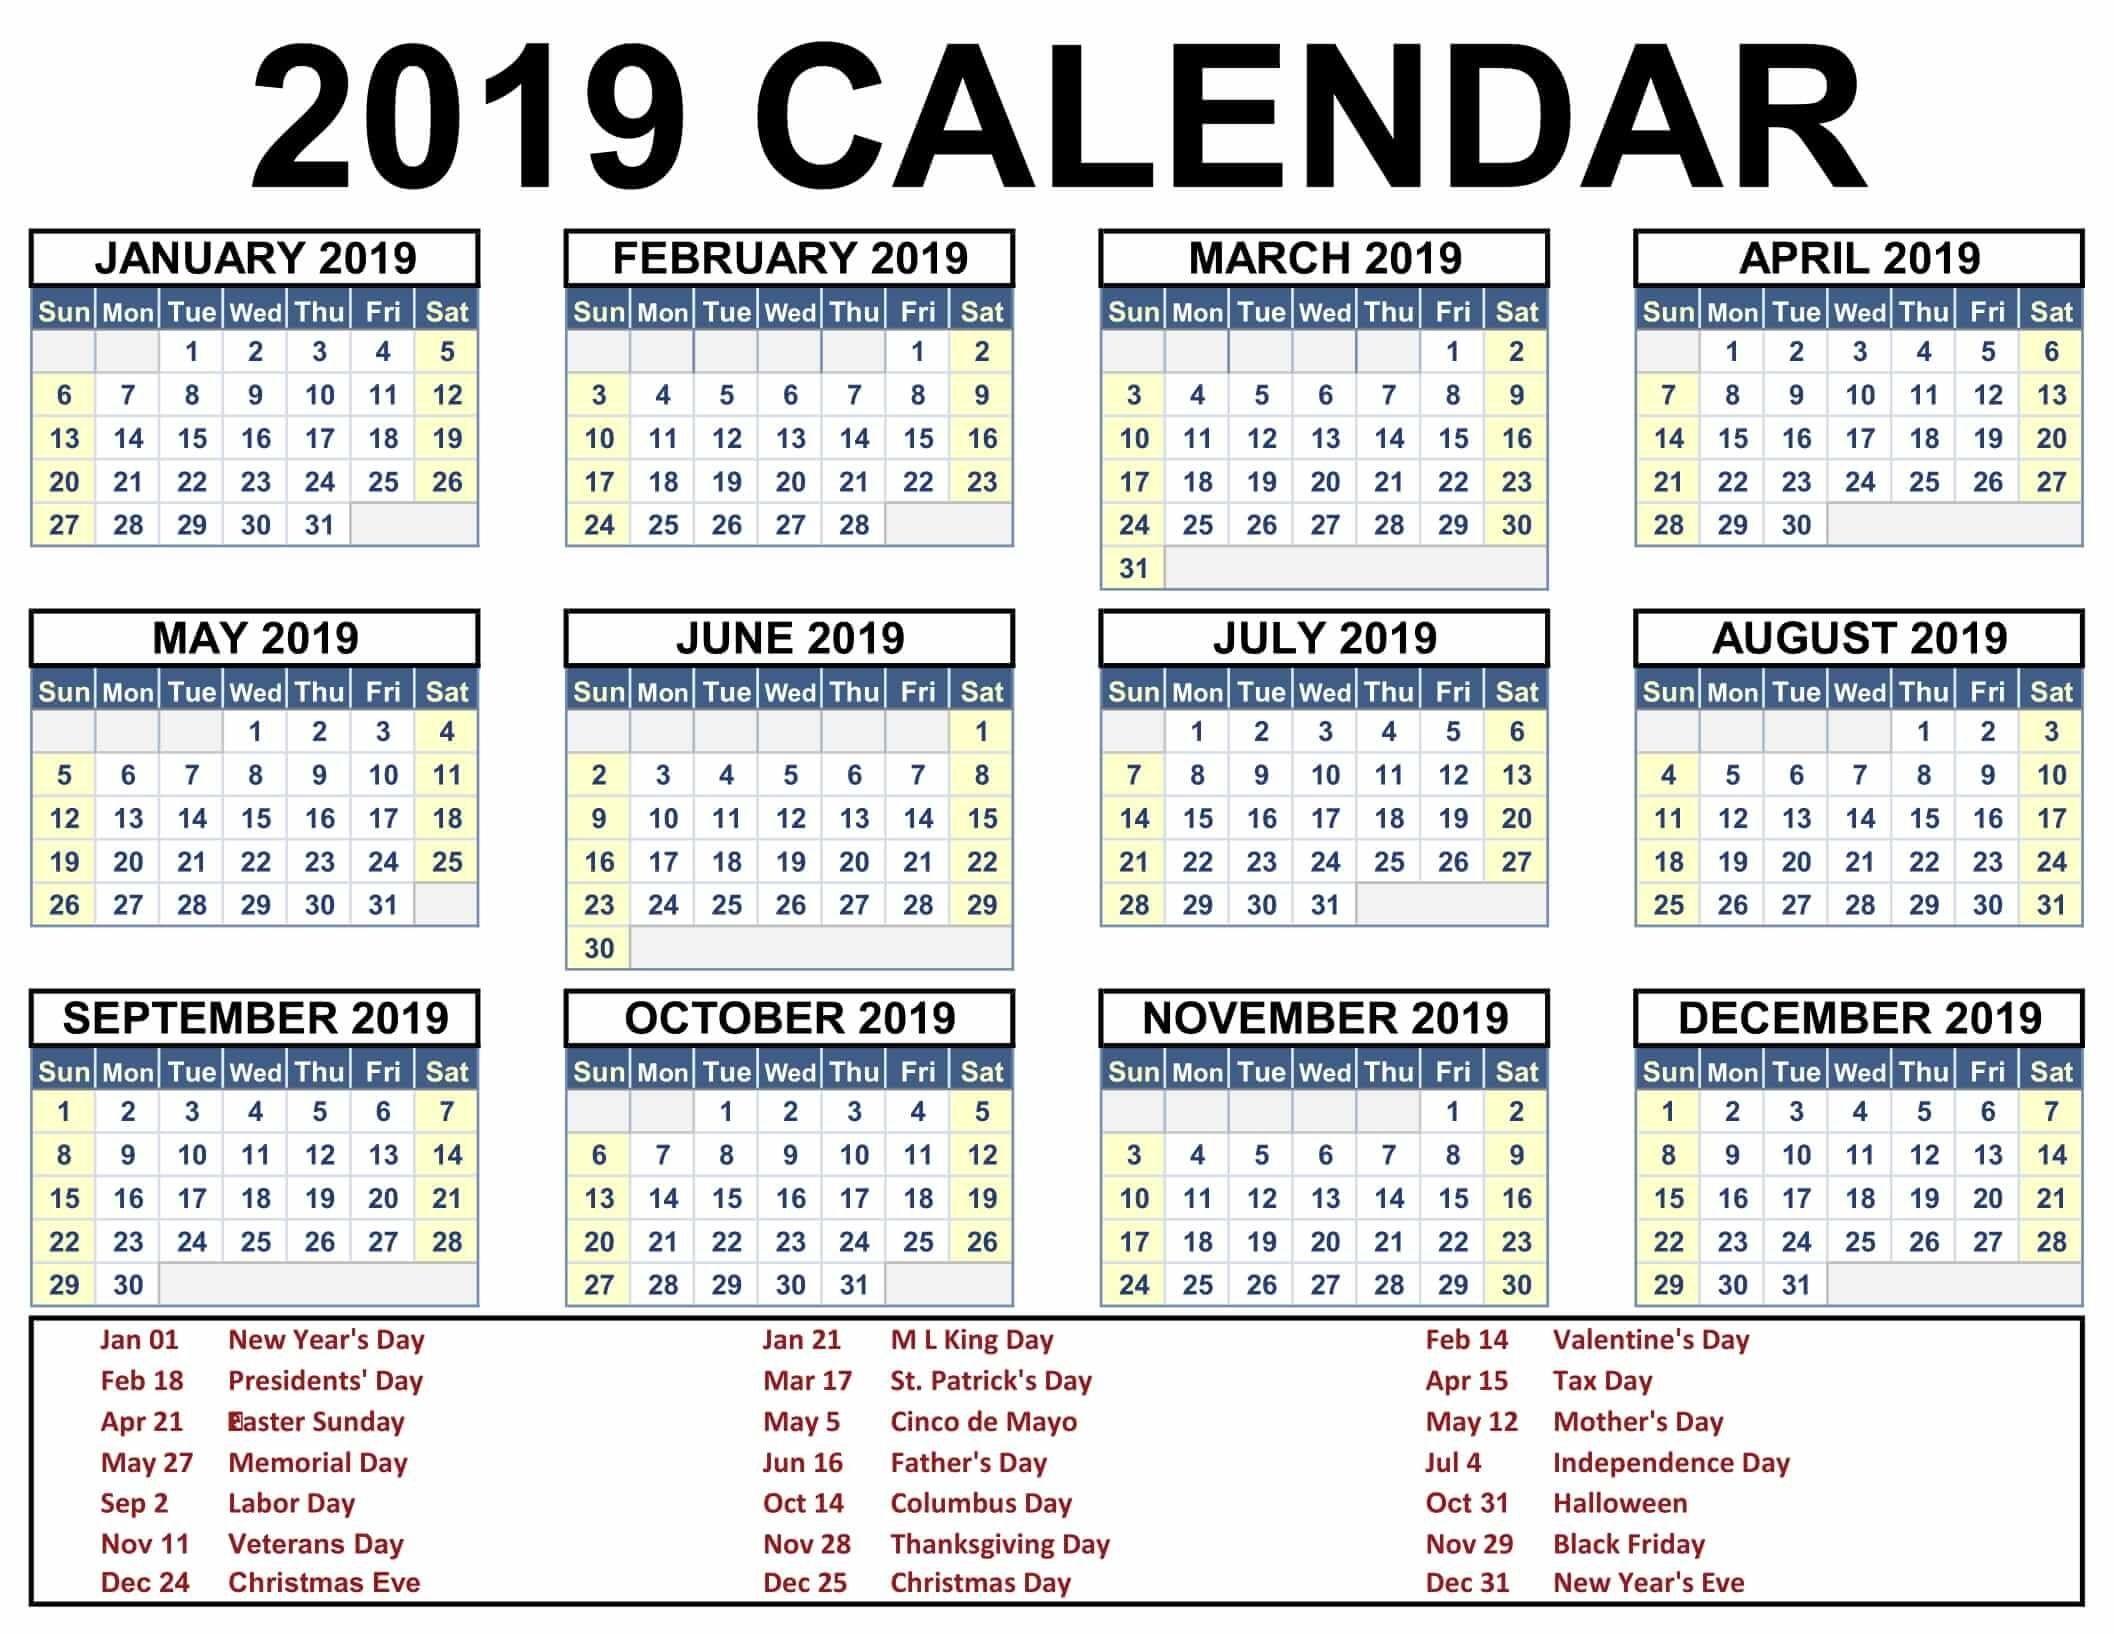 2019 Calendar With Holidays Printable #2019Calendar pertaining to Free Printable Event Calendar Template